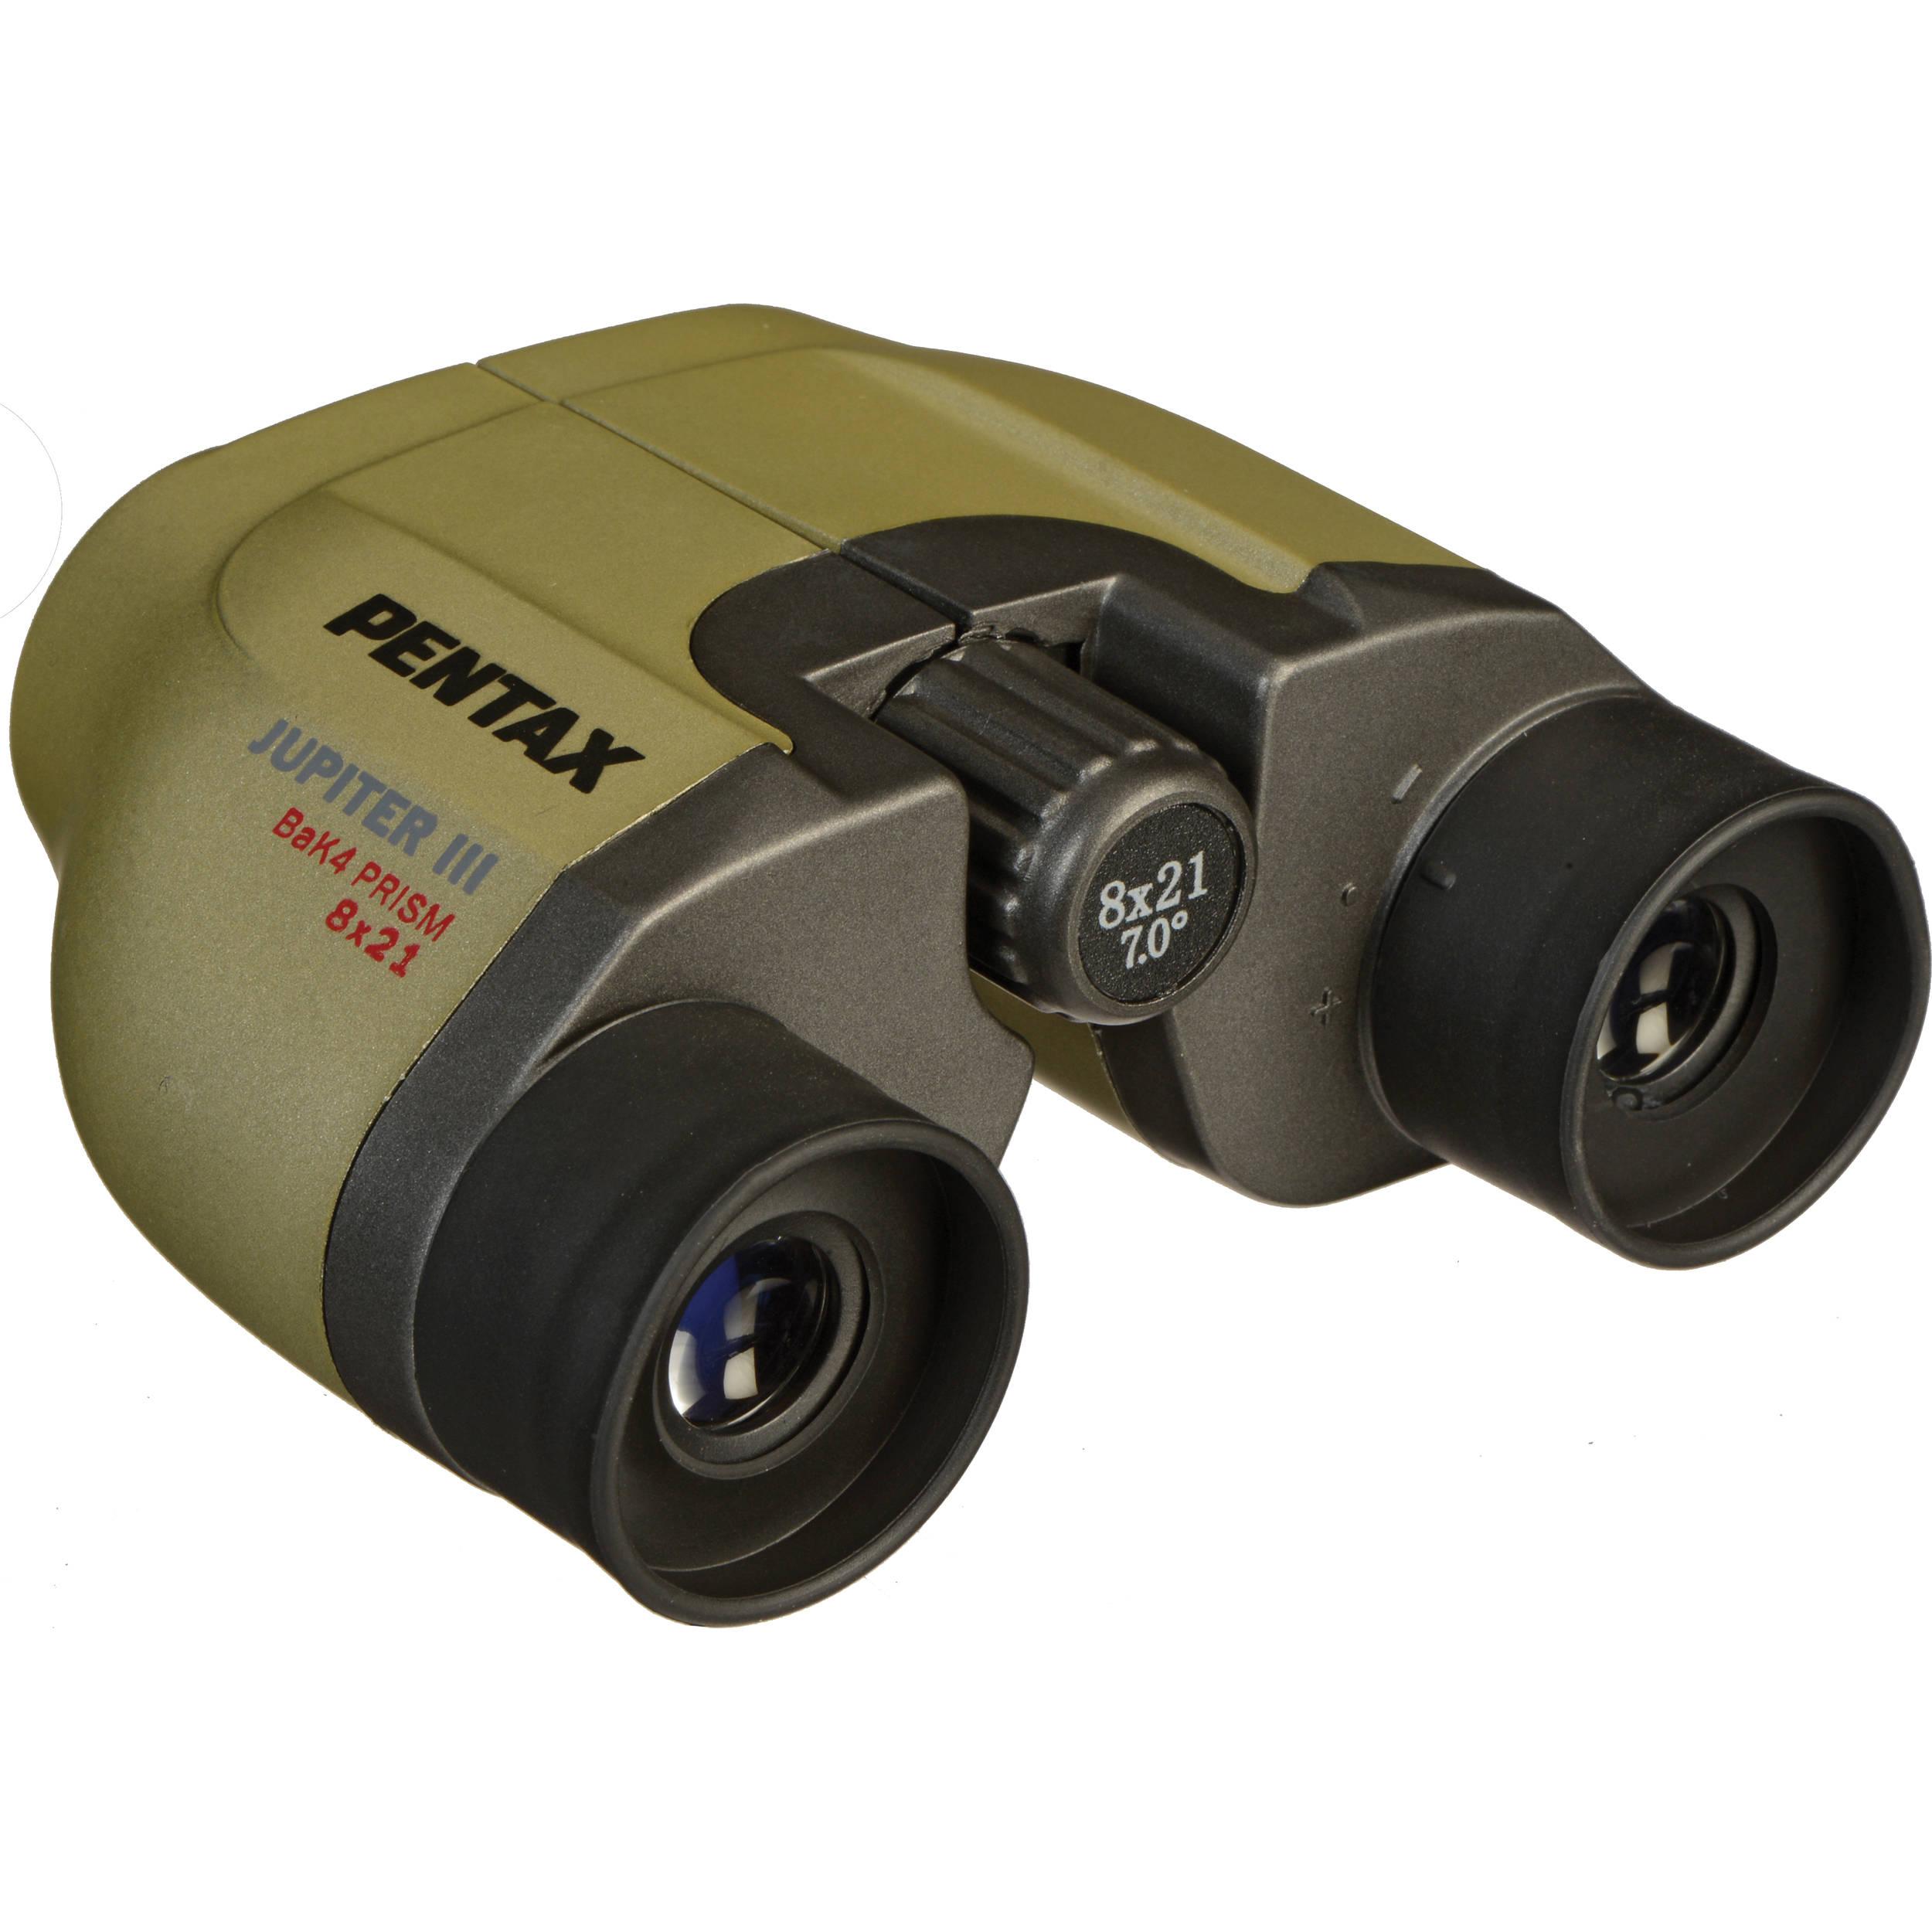 pentax 8x21 mcf ii jupiter binocular kb61393 b h photo video rh bhphotovideo com Pentax 62217 UCF II 8 16X21 Zoom Binocular Pentax Gameseeker